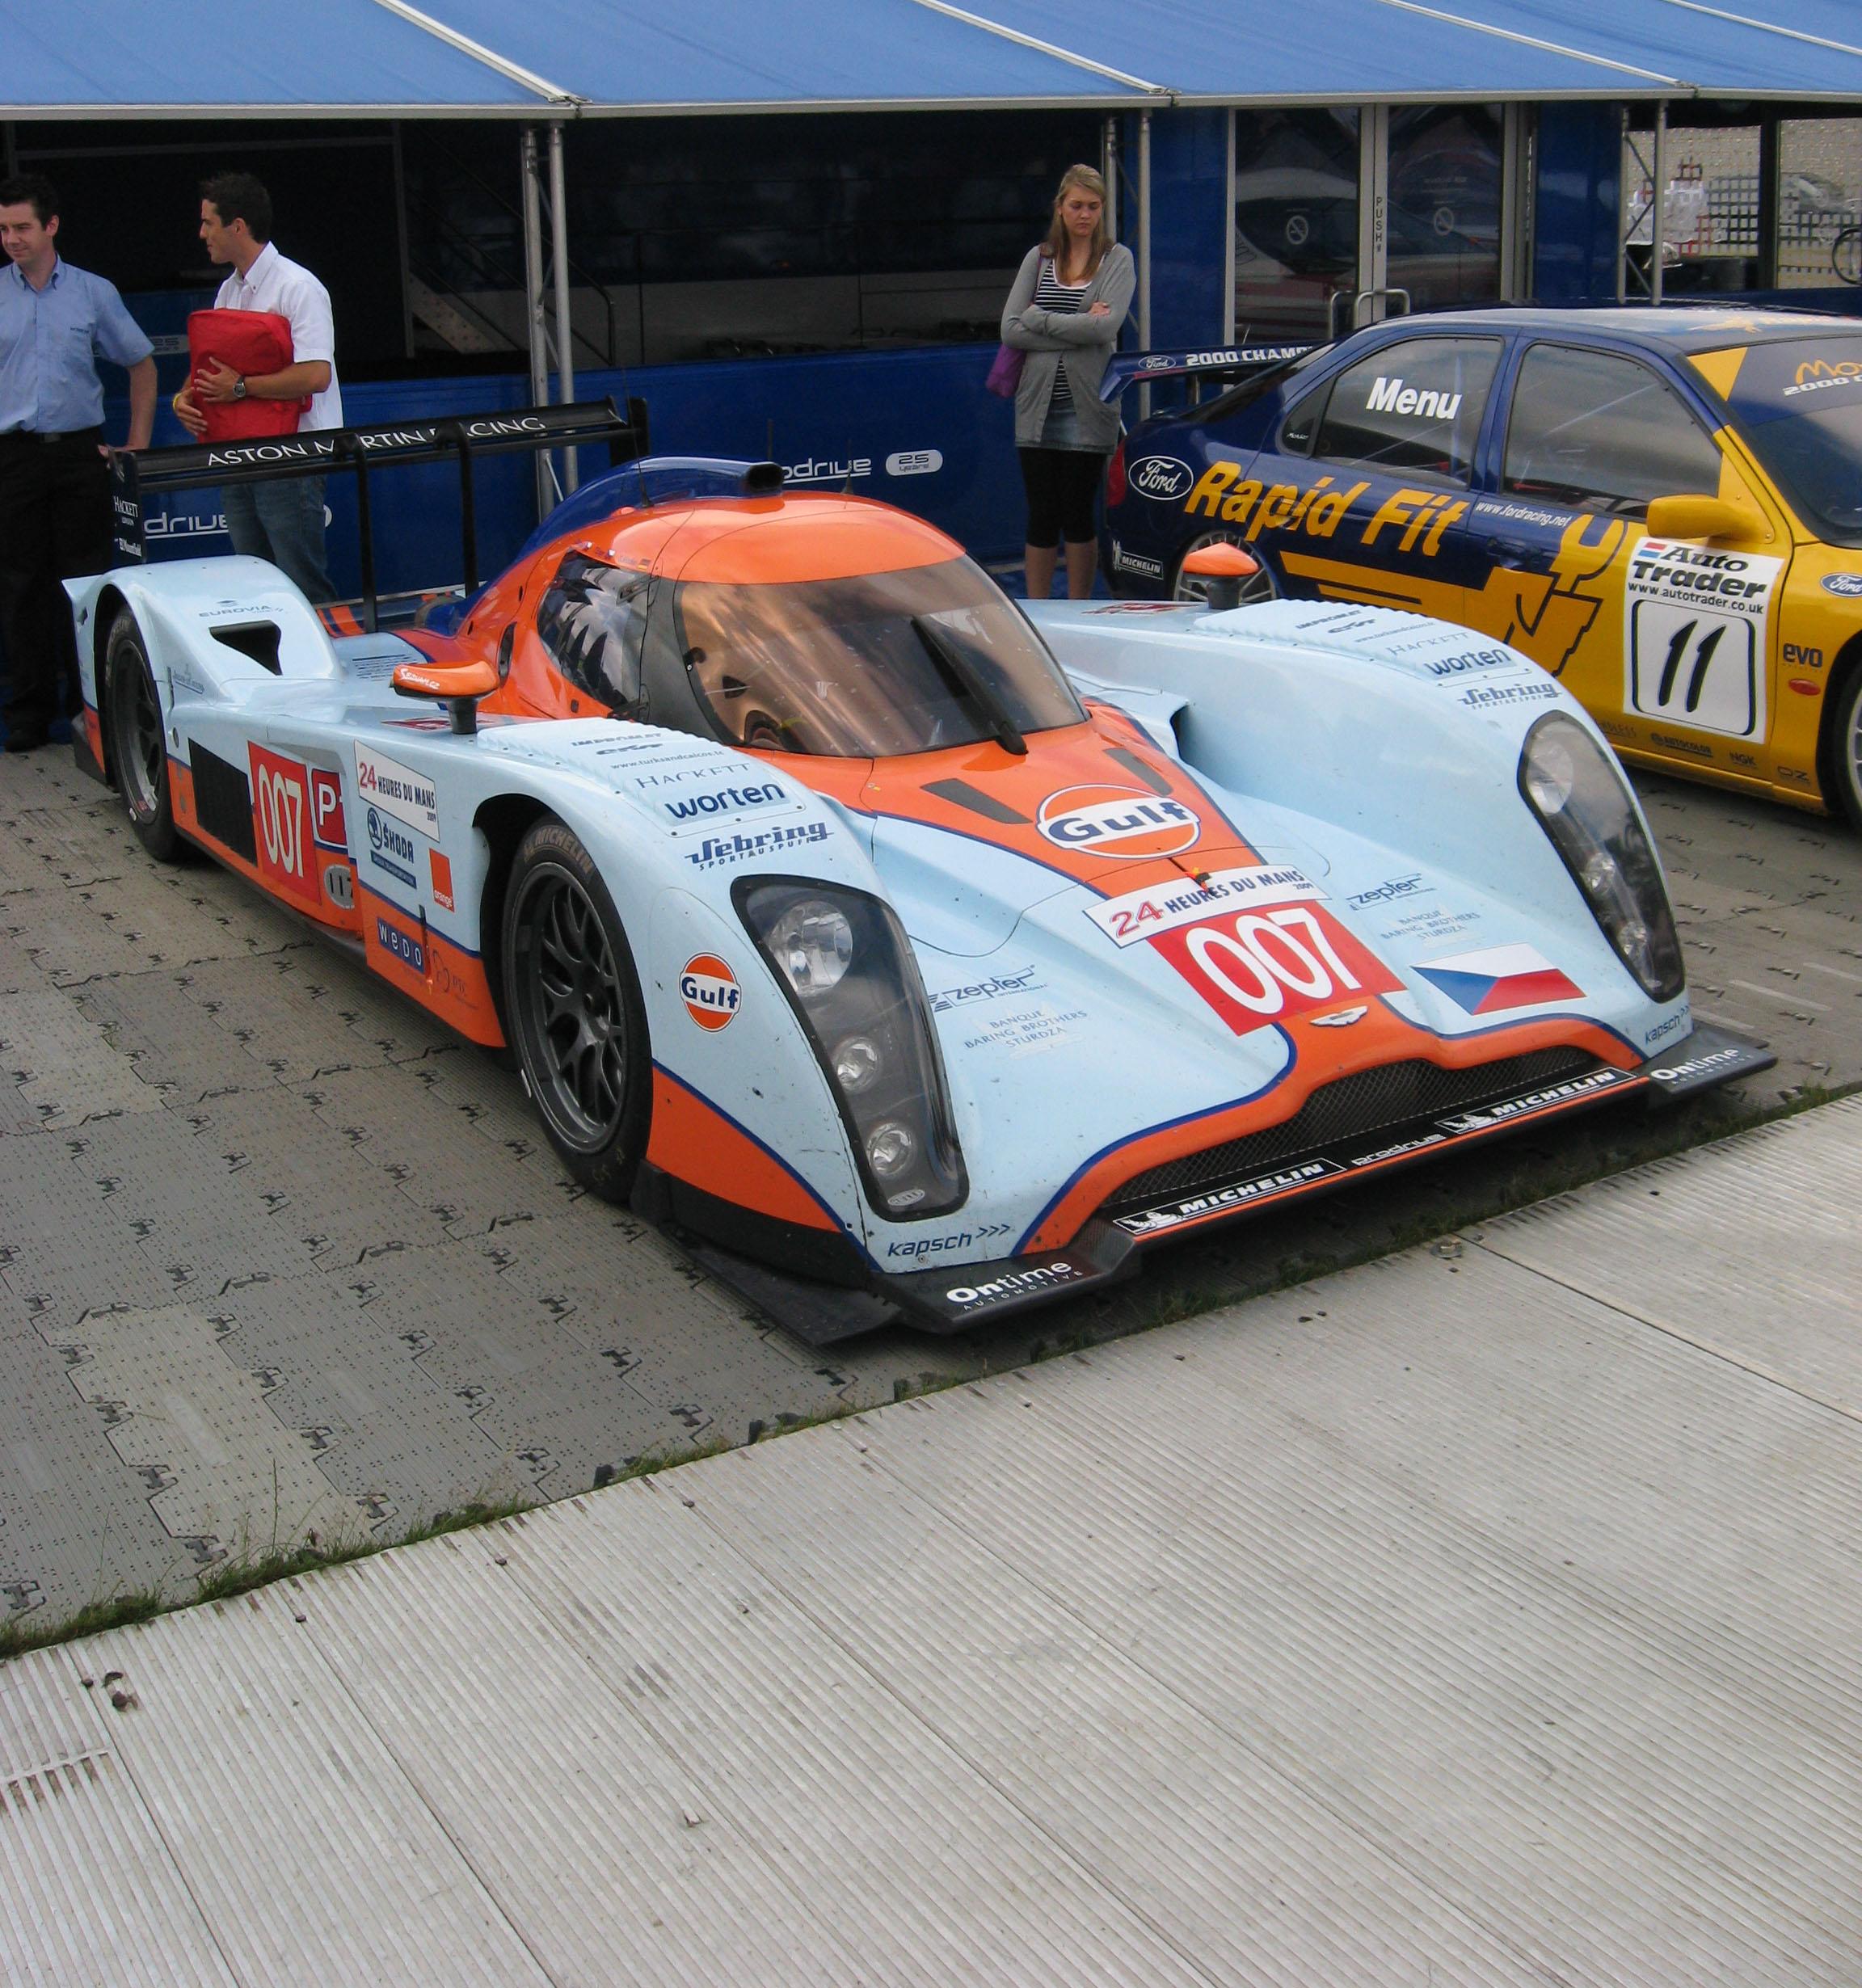 Permalink to Aston Martin Car Gta 5